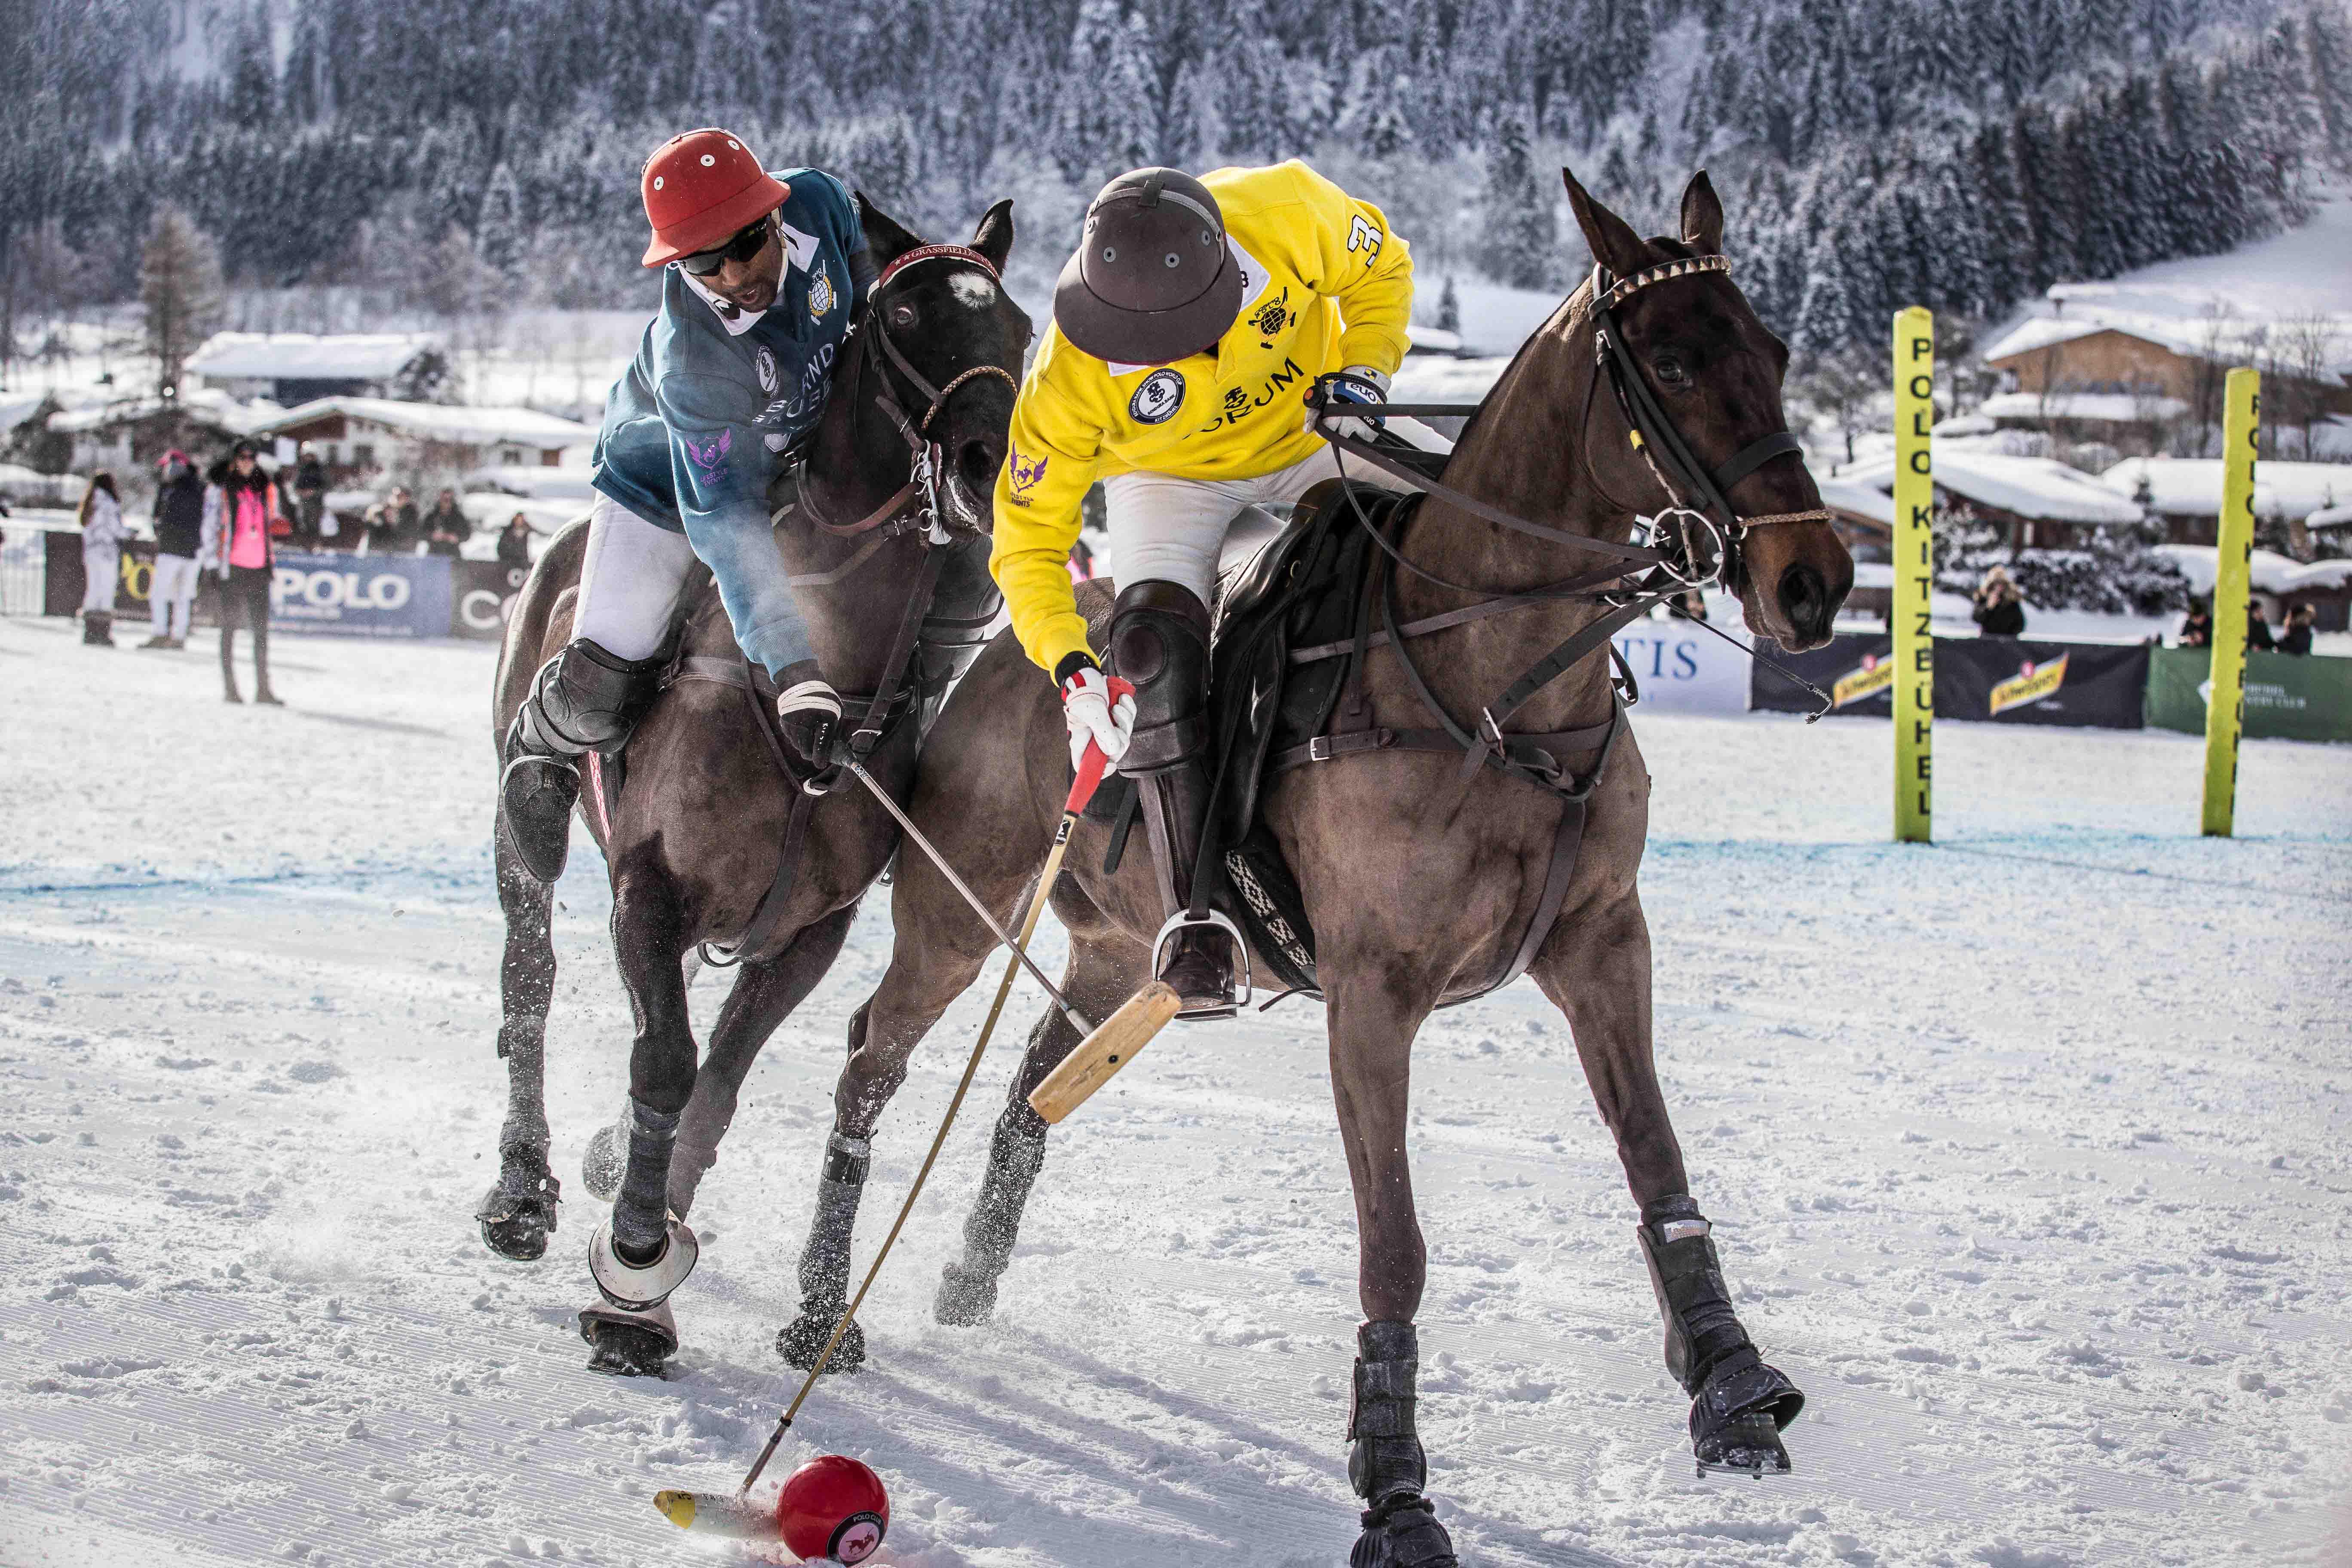 Snow Polo Kitzbühel 2019